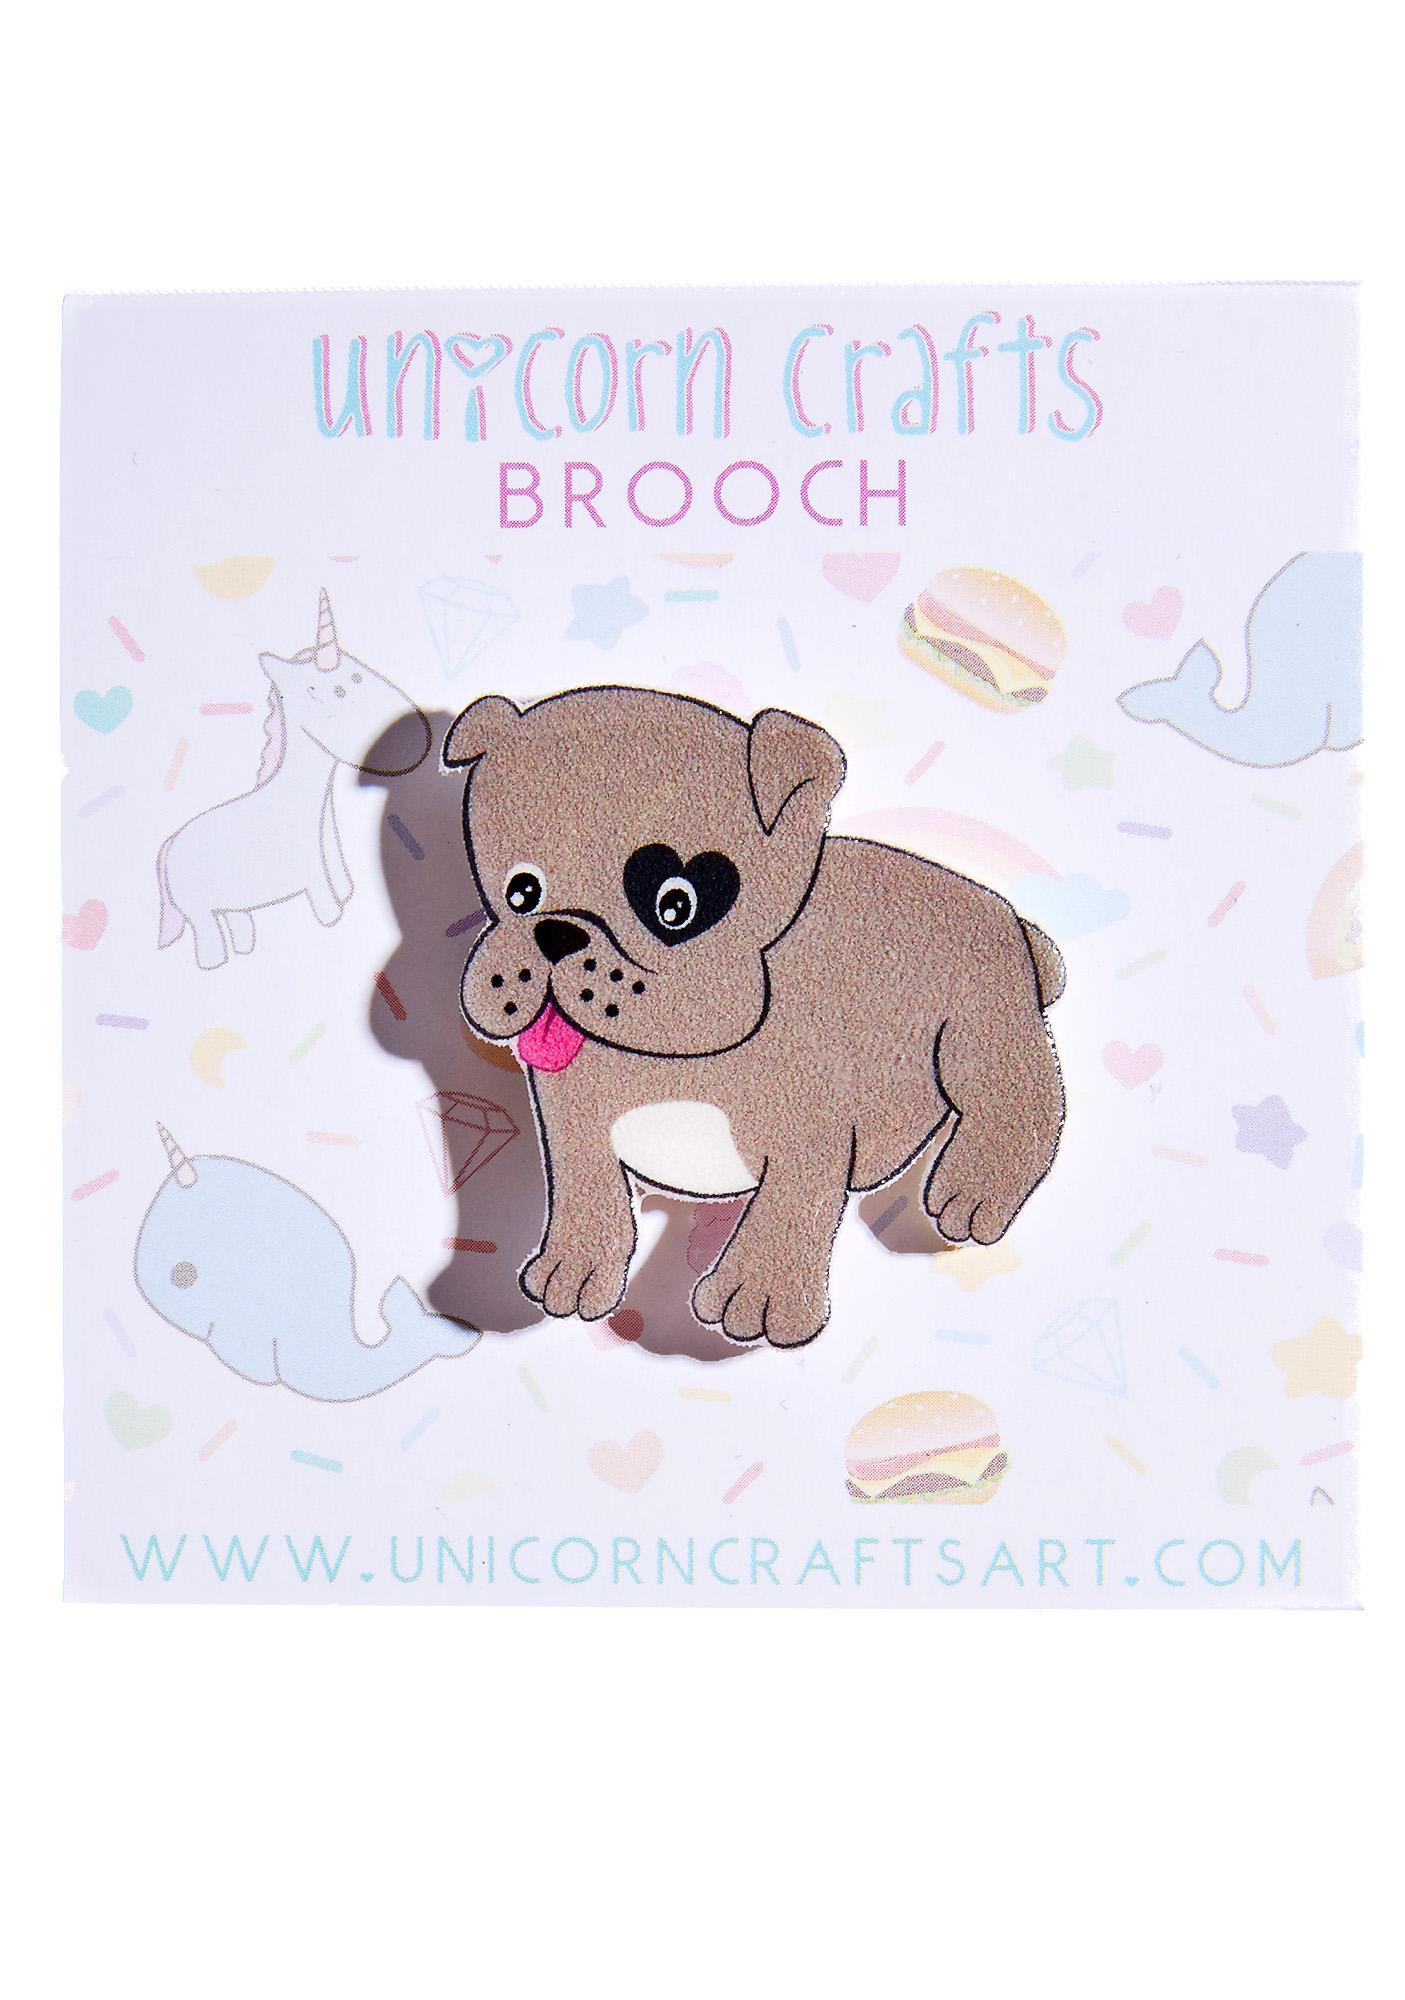 Unicorn Crafts Bulldog Brooch